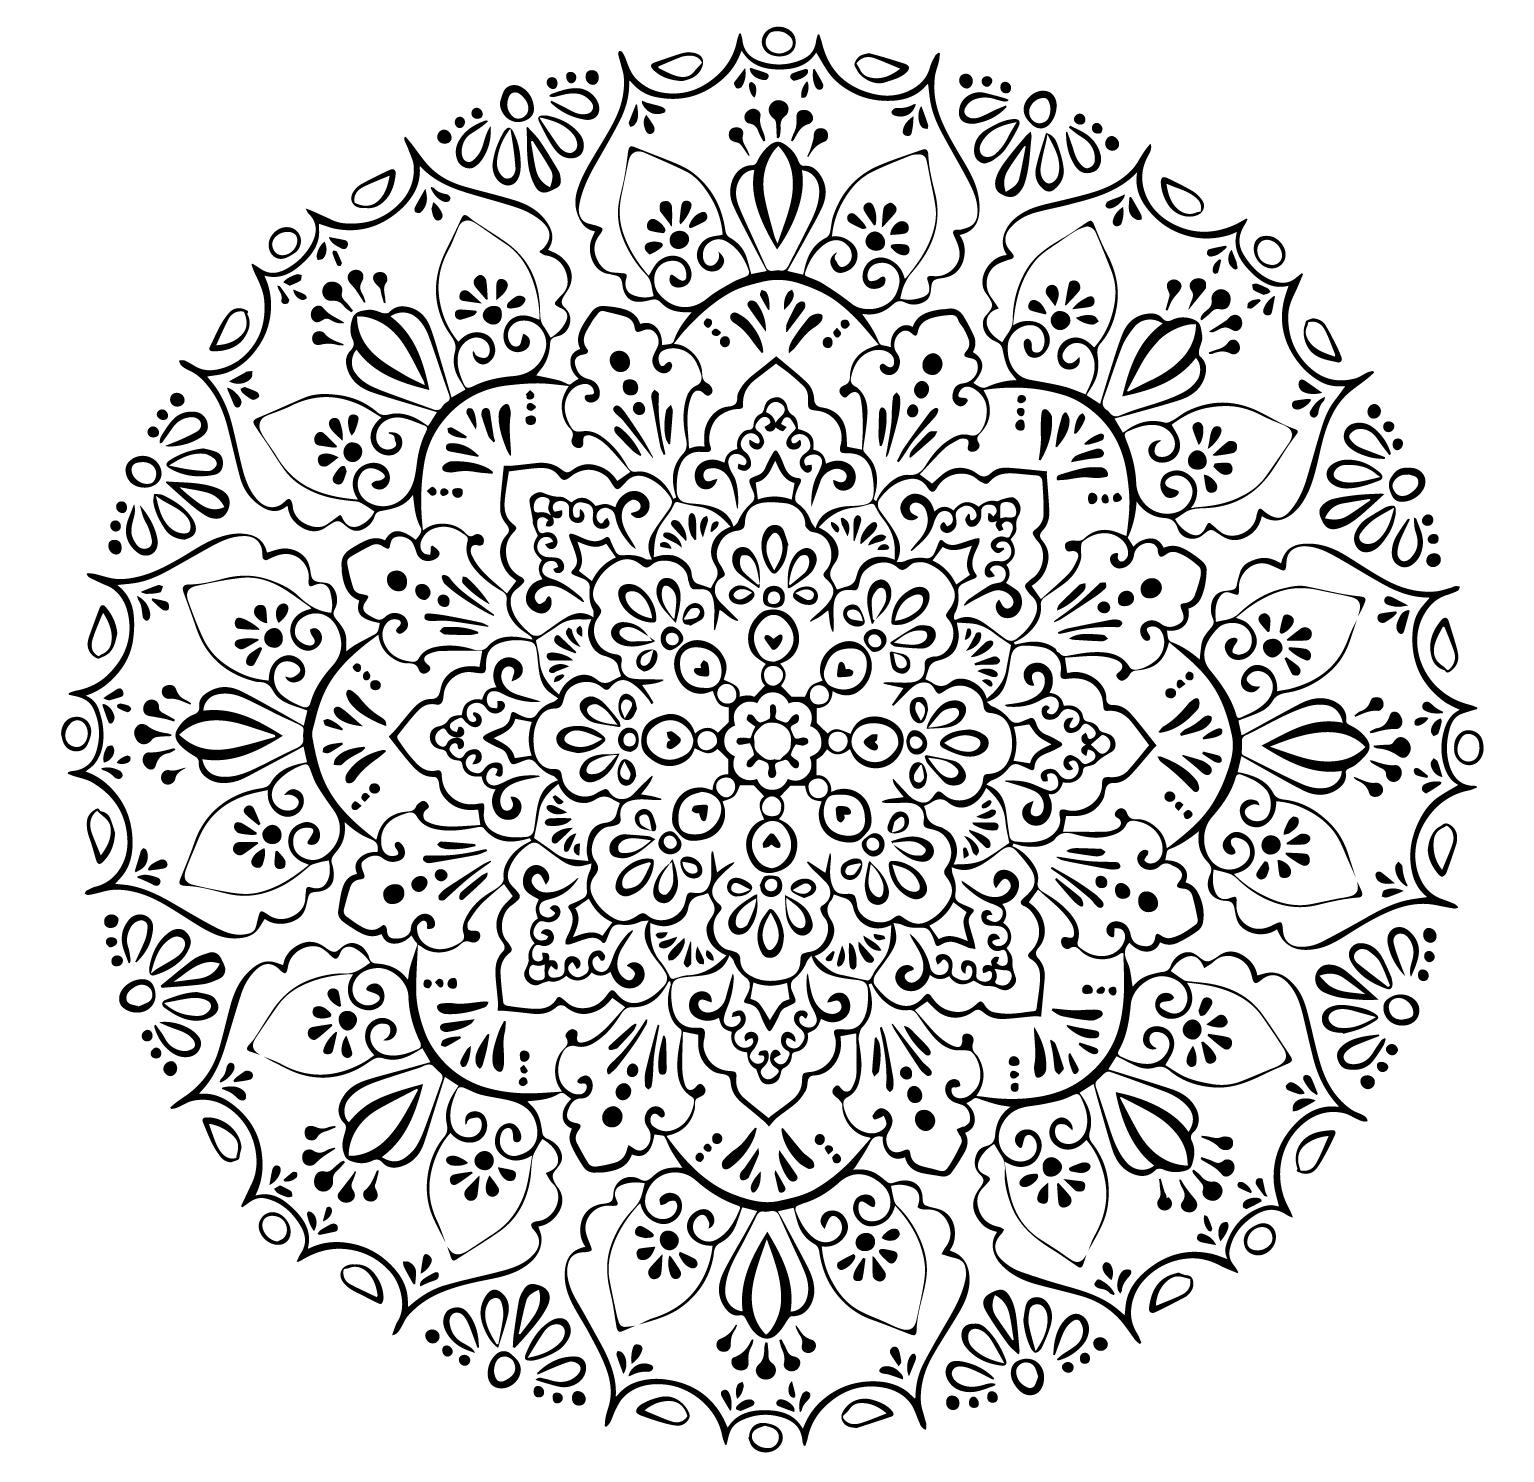 Мандала со значением - Мандала - Раскраски антистресс